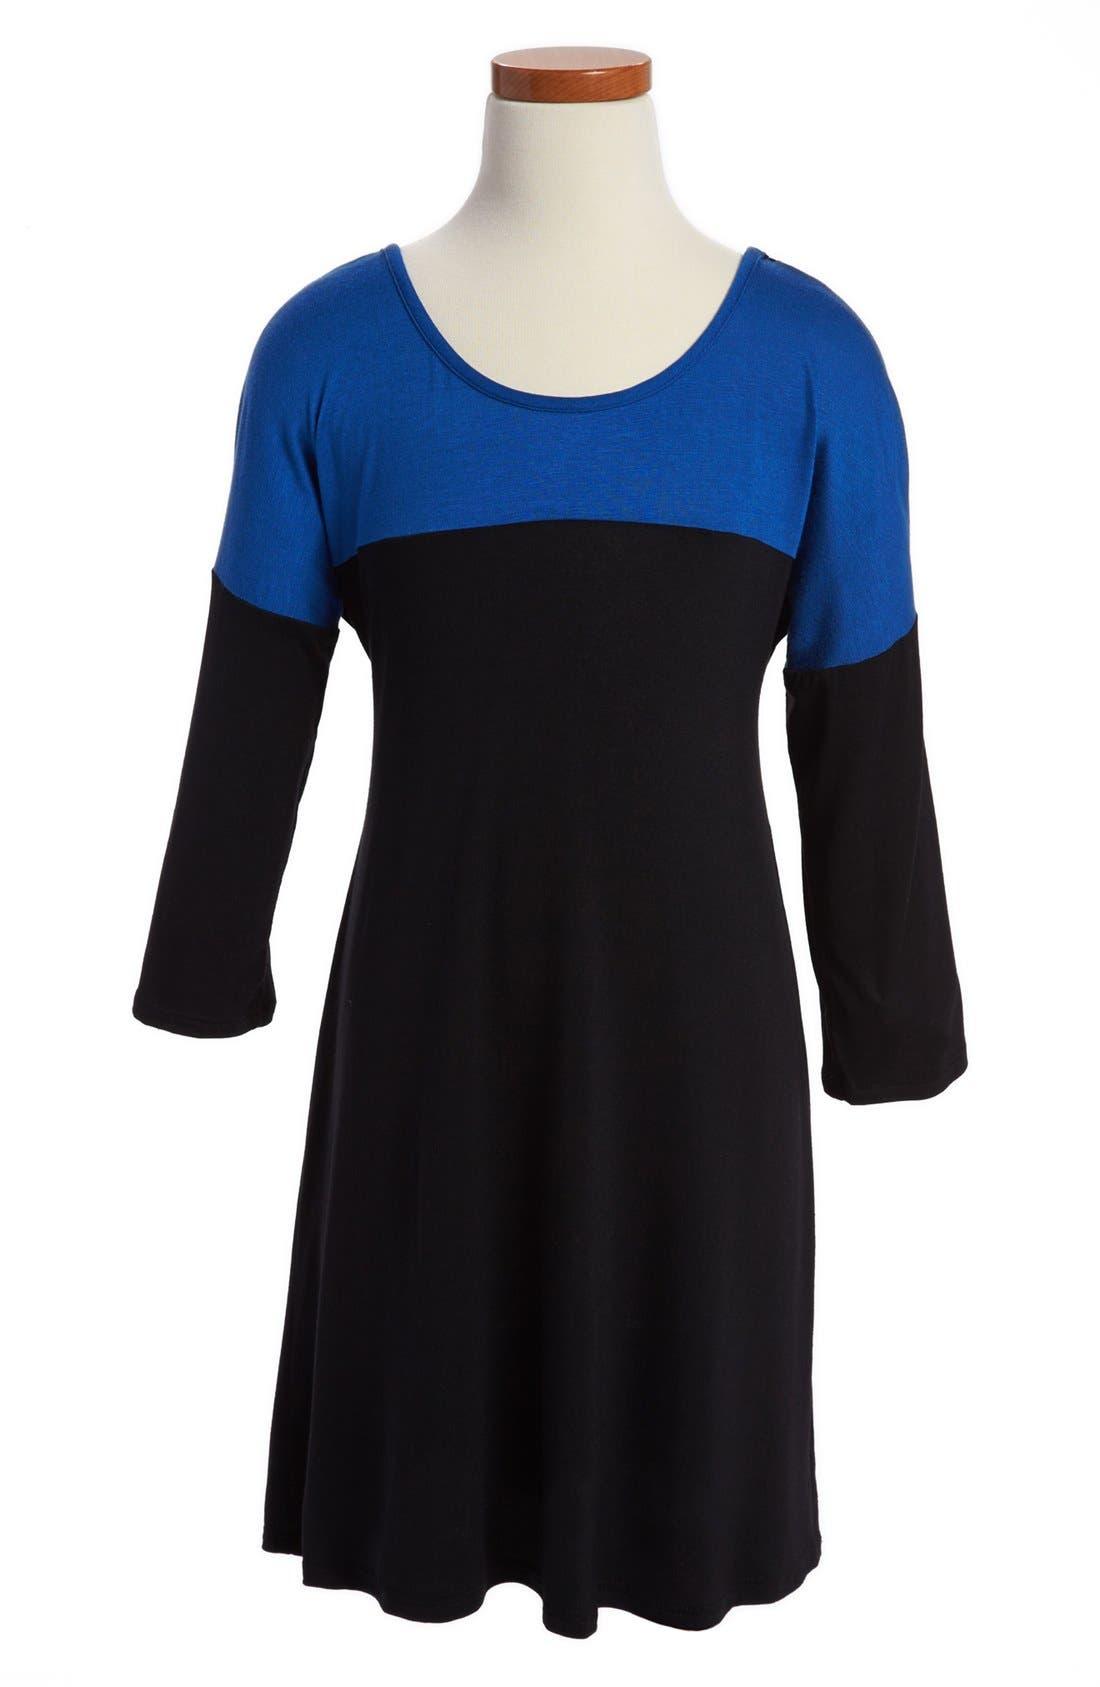 Alternate Image 1 Selected - Sally Miller Lace Back Dress (Big Girls)